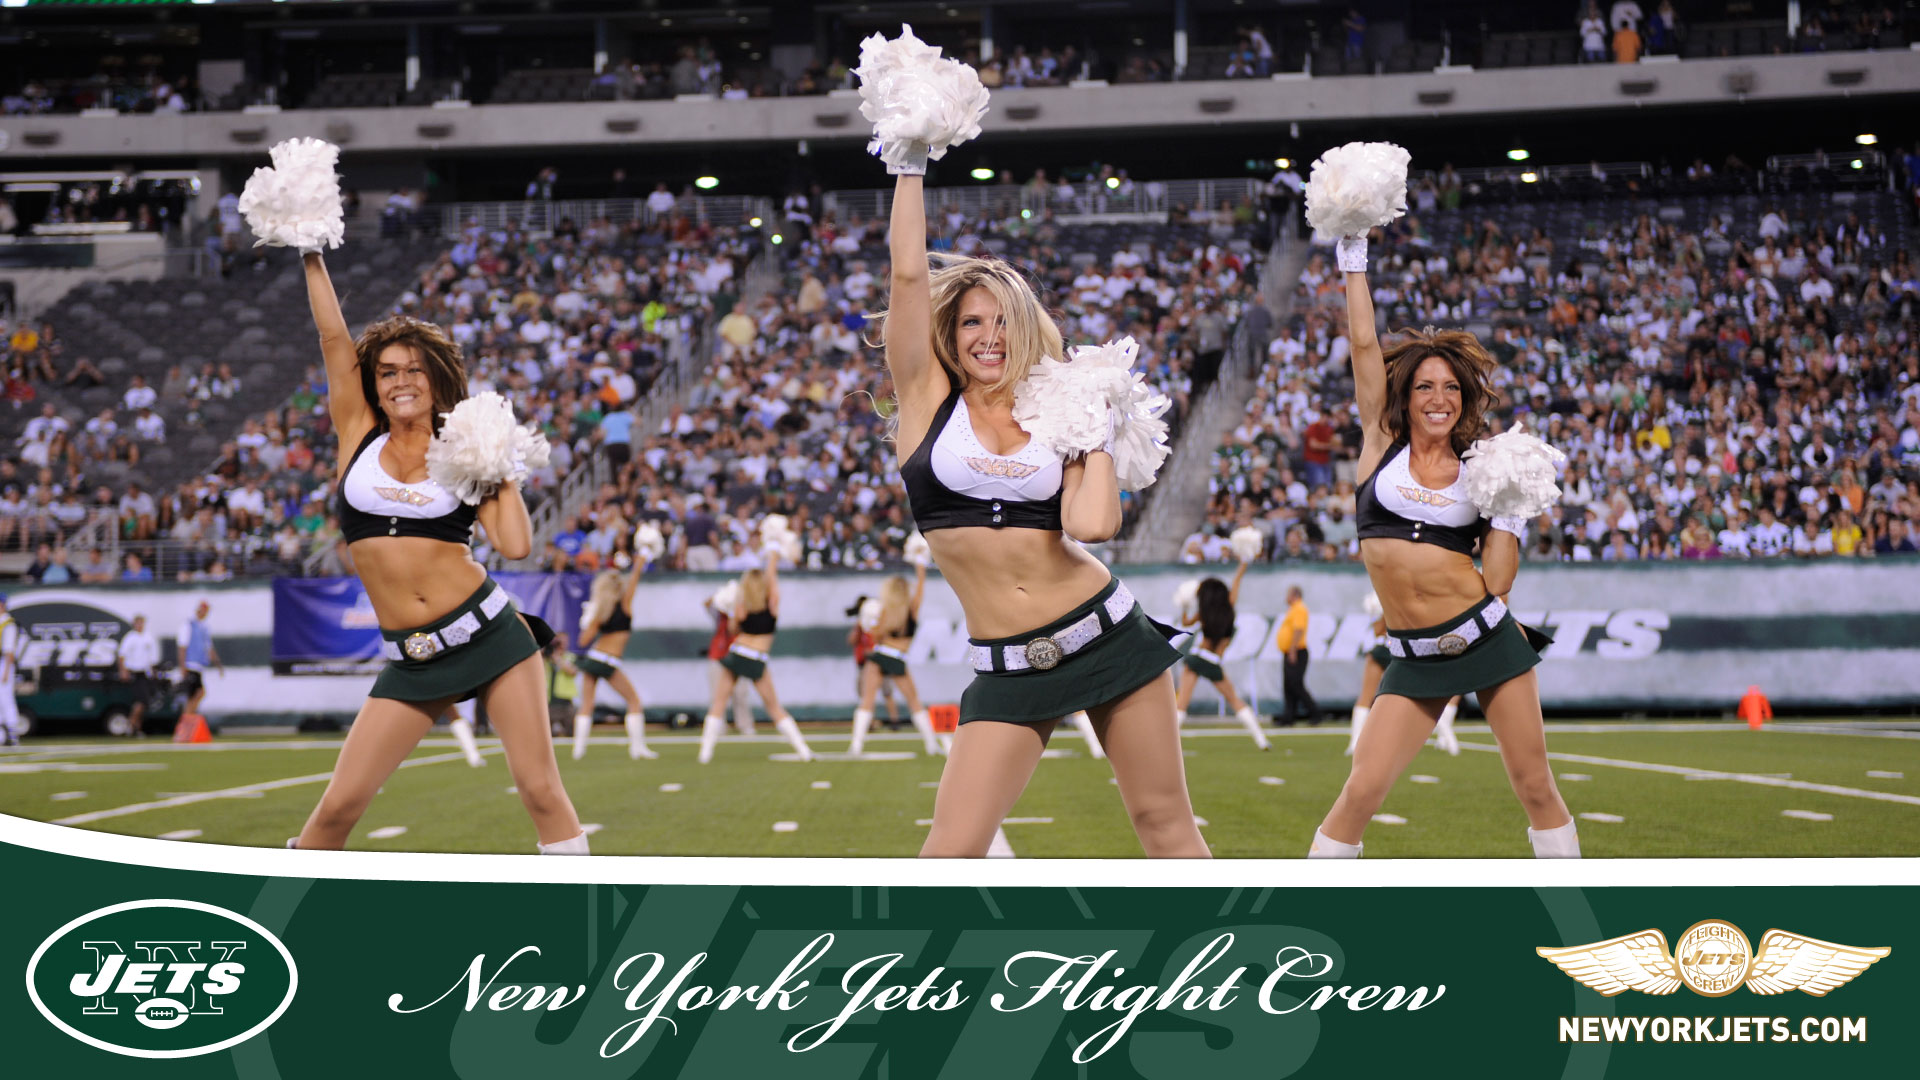 Fondos De New York Jets Wallpaper Logos And Uniforms Of The New